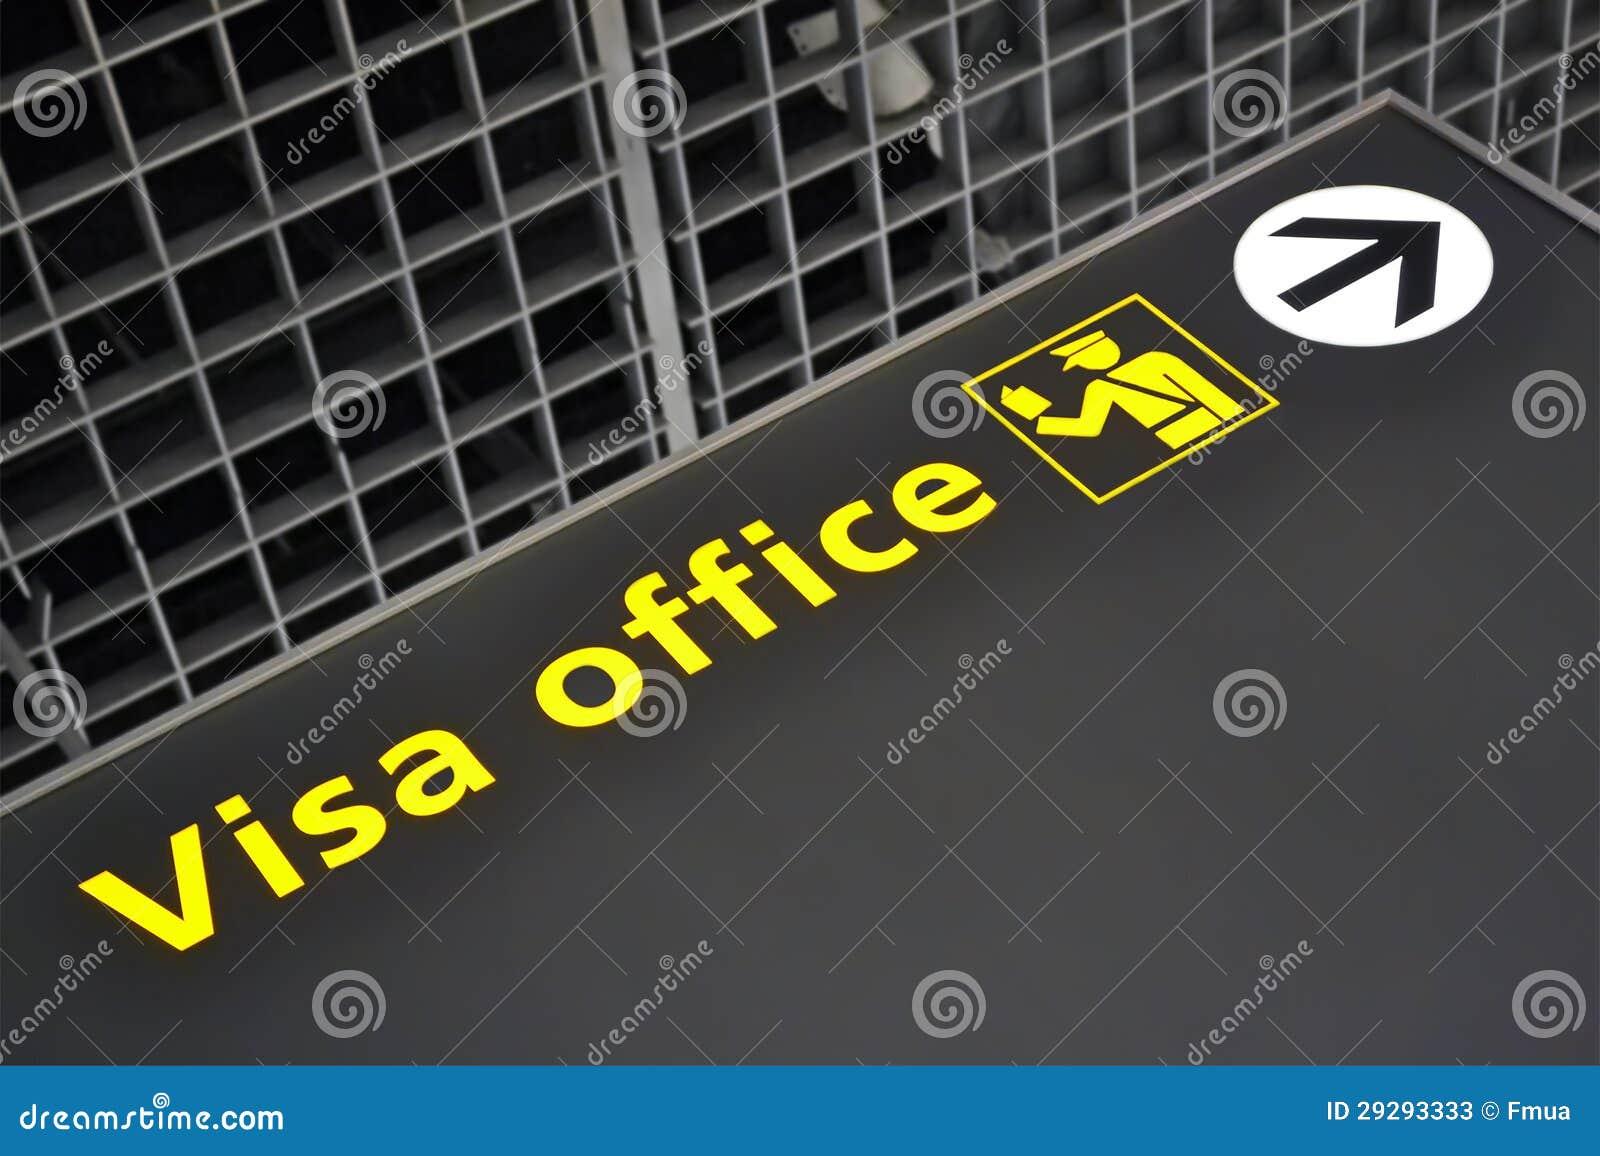 Visa office direction sign airport travel diversity stock image royalty free stock photo biocorpaavc Choice Image